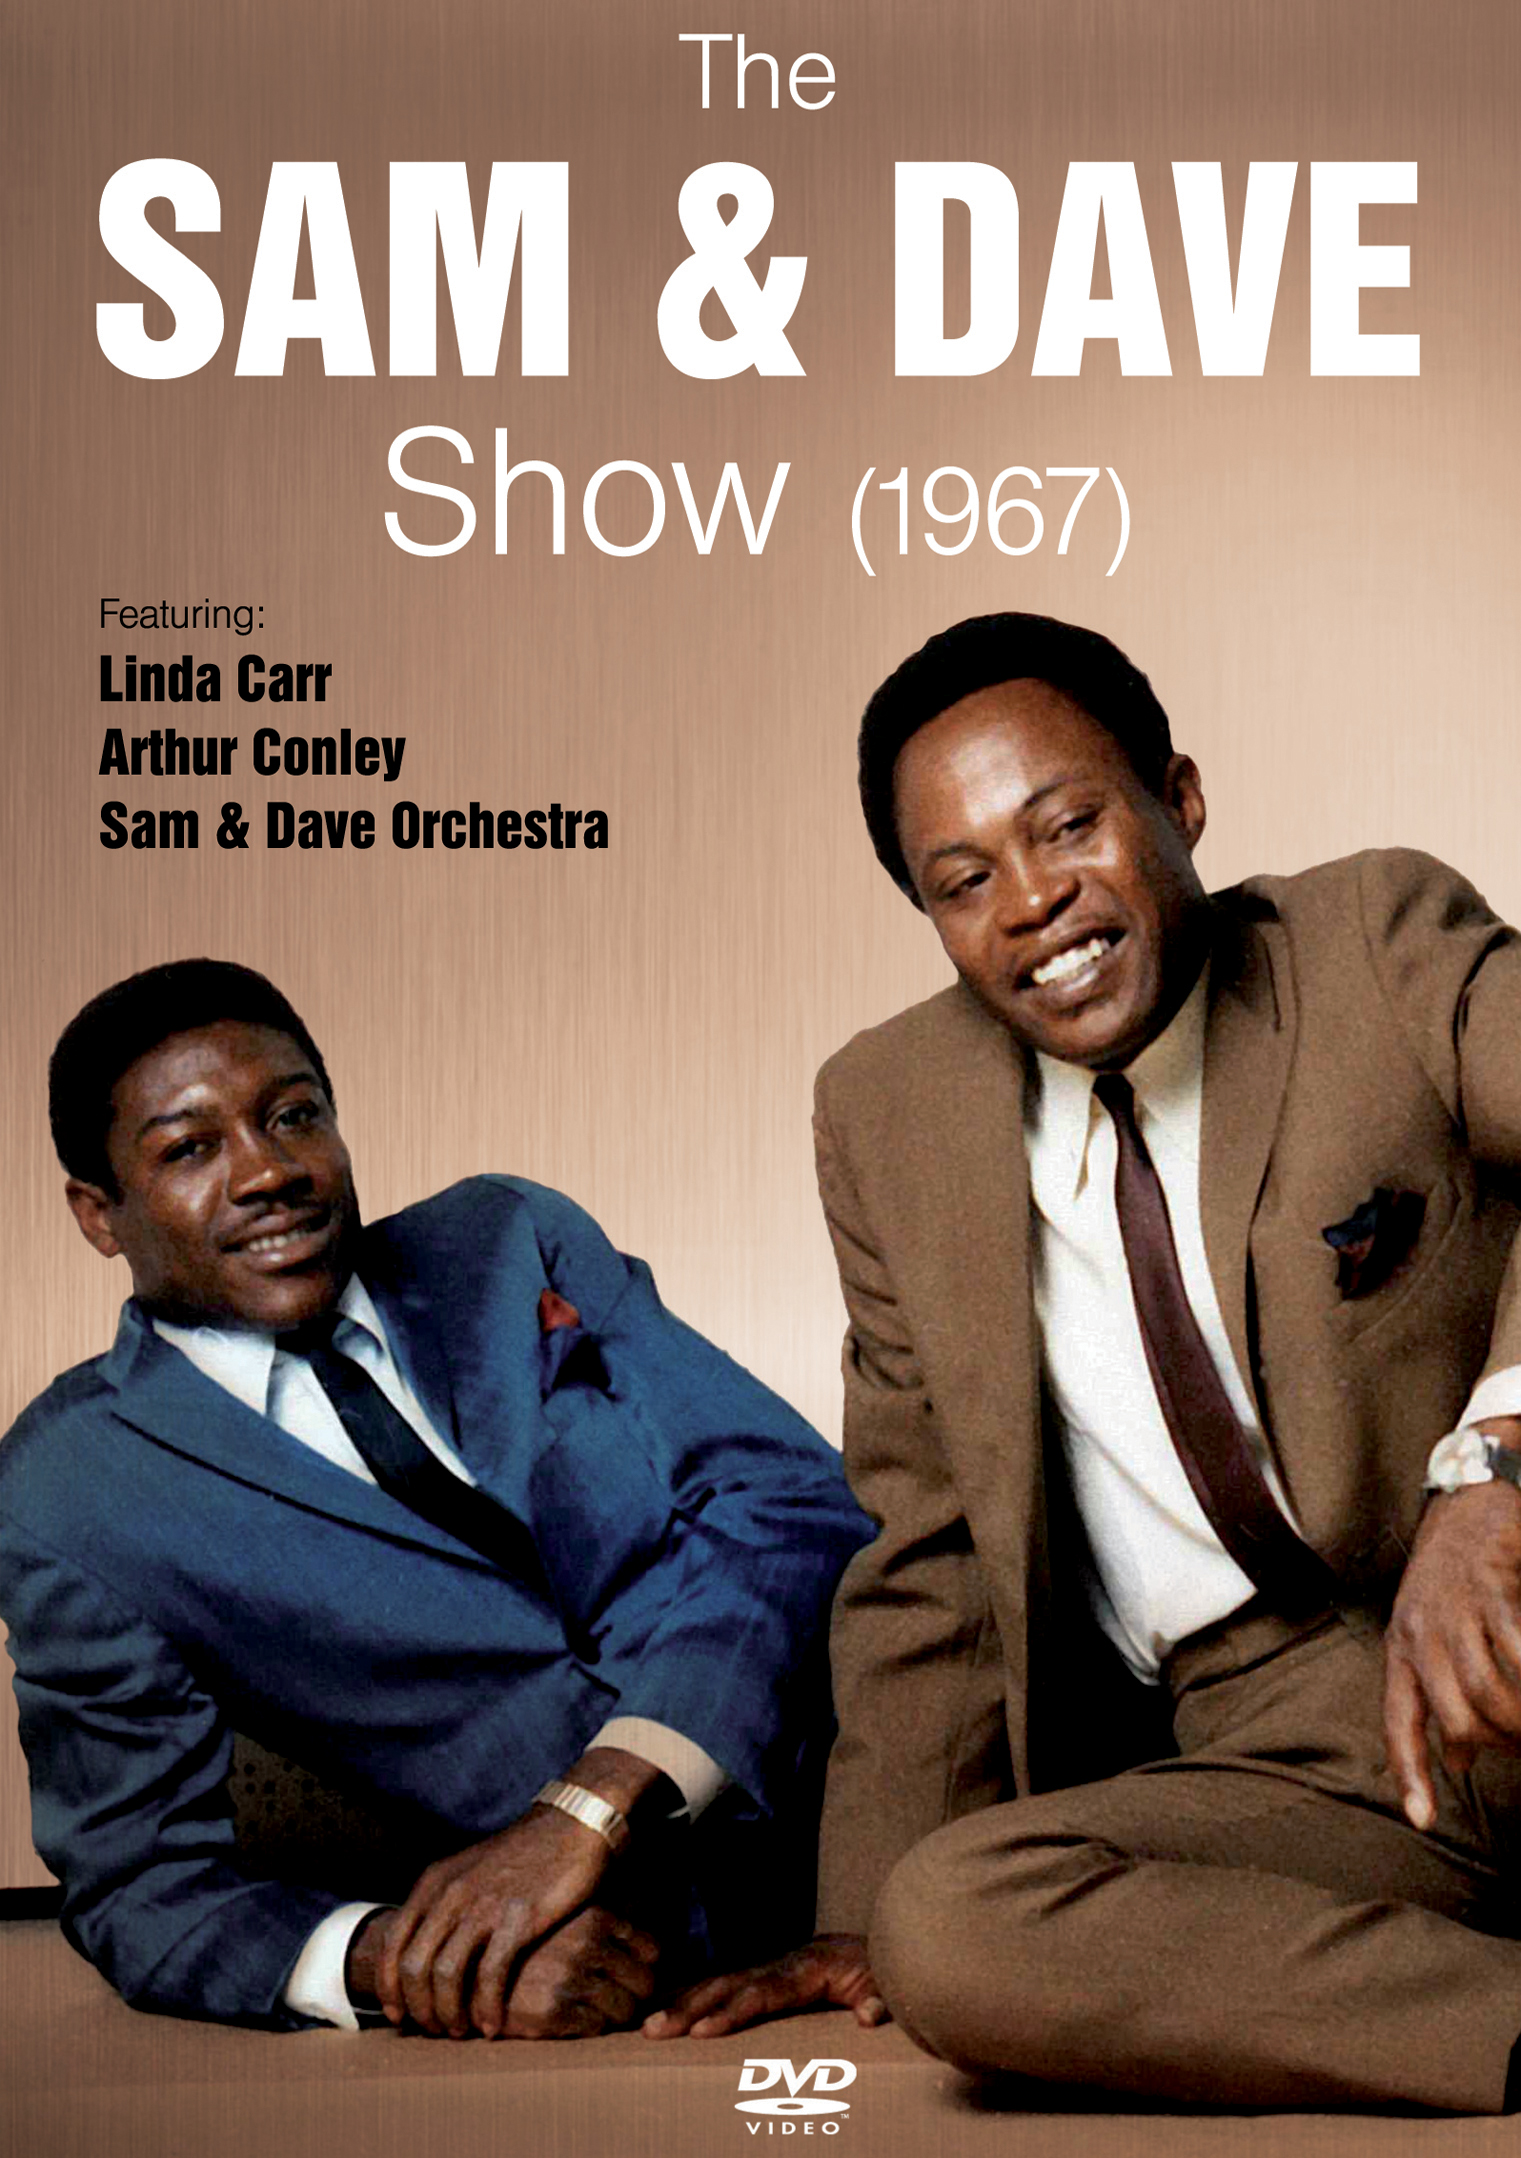 The Sam & Dave Show (1967)